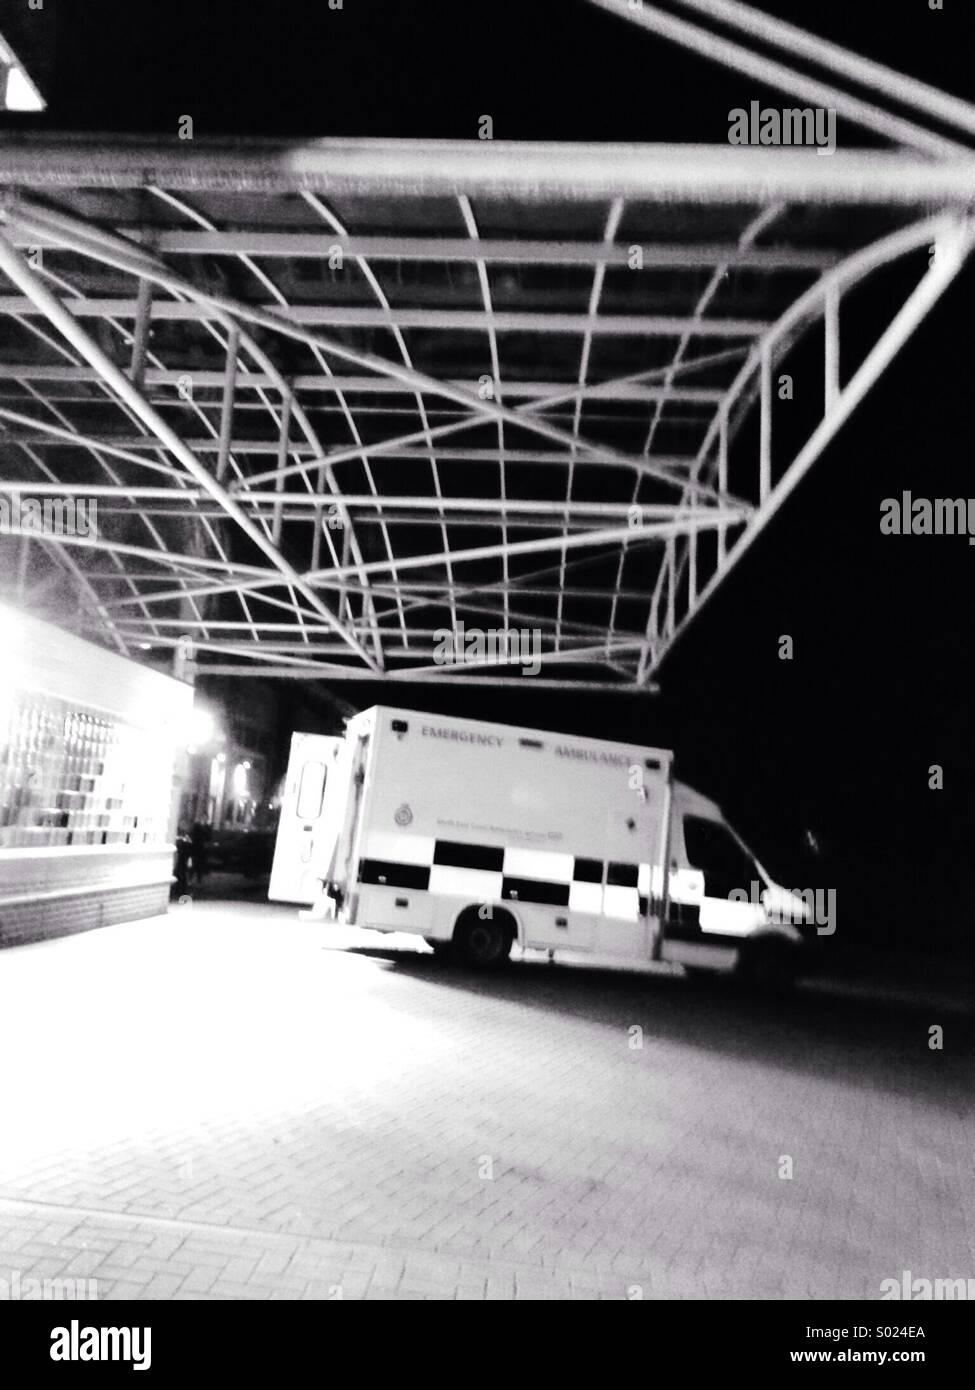 Ambulance  at A & E at night Epsom  General - Stock Image